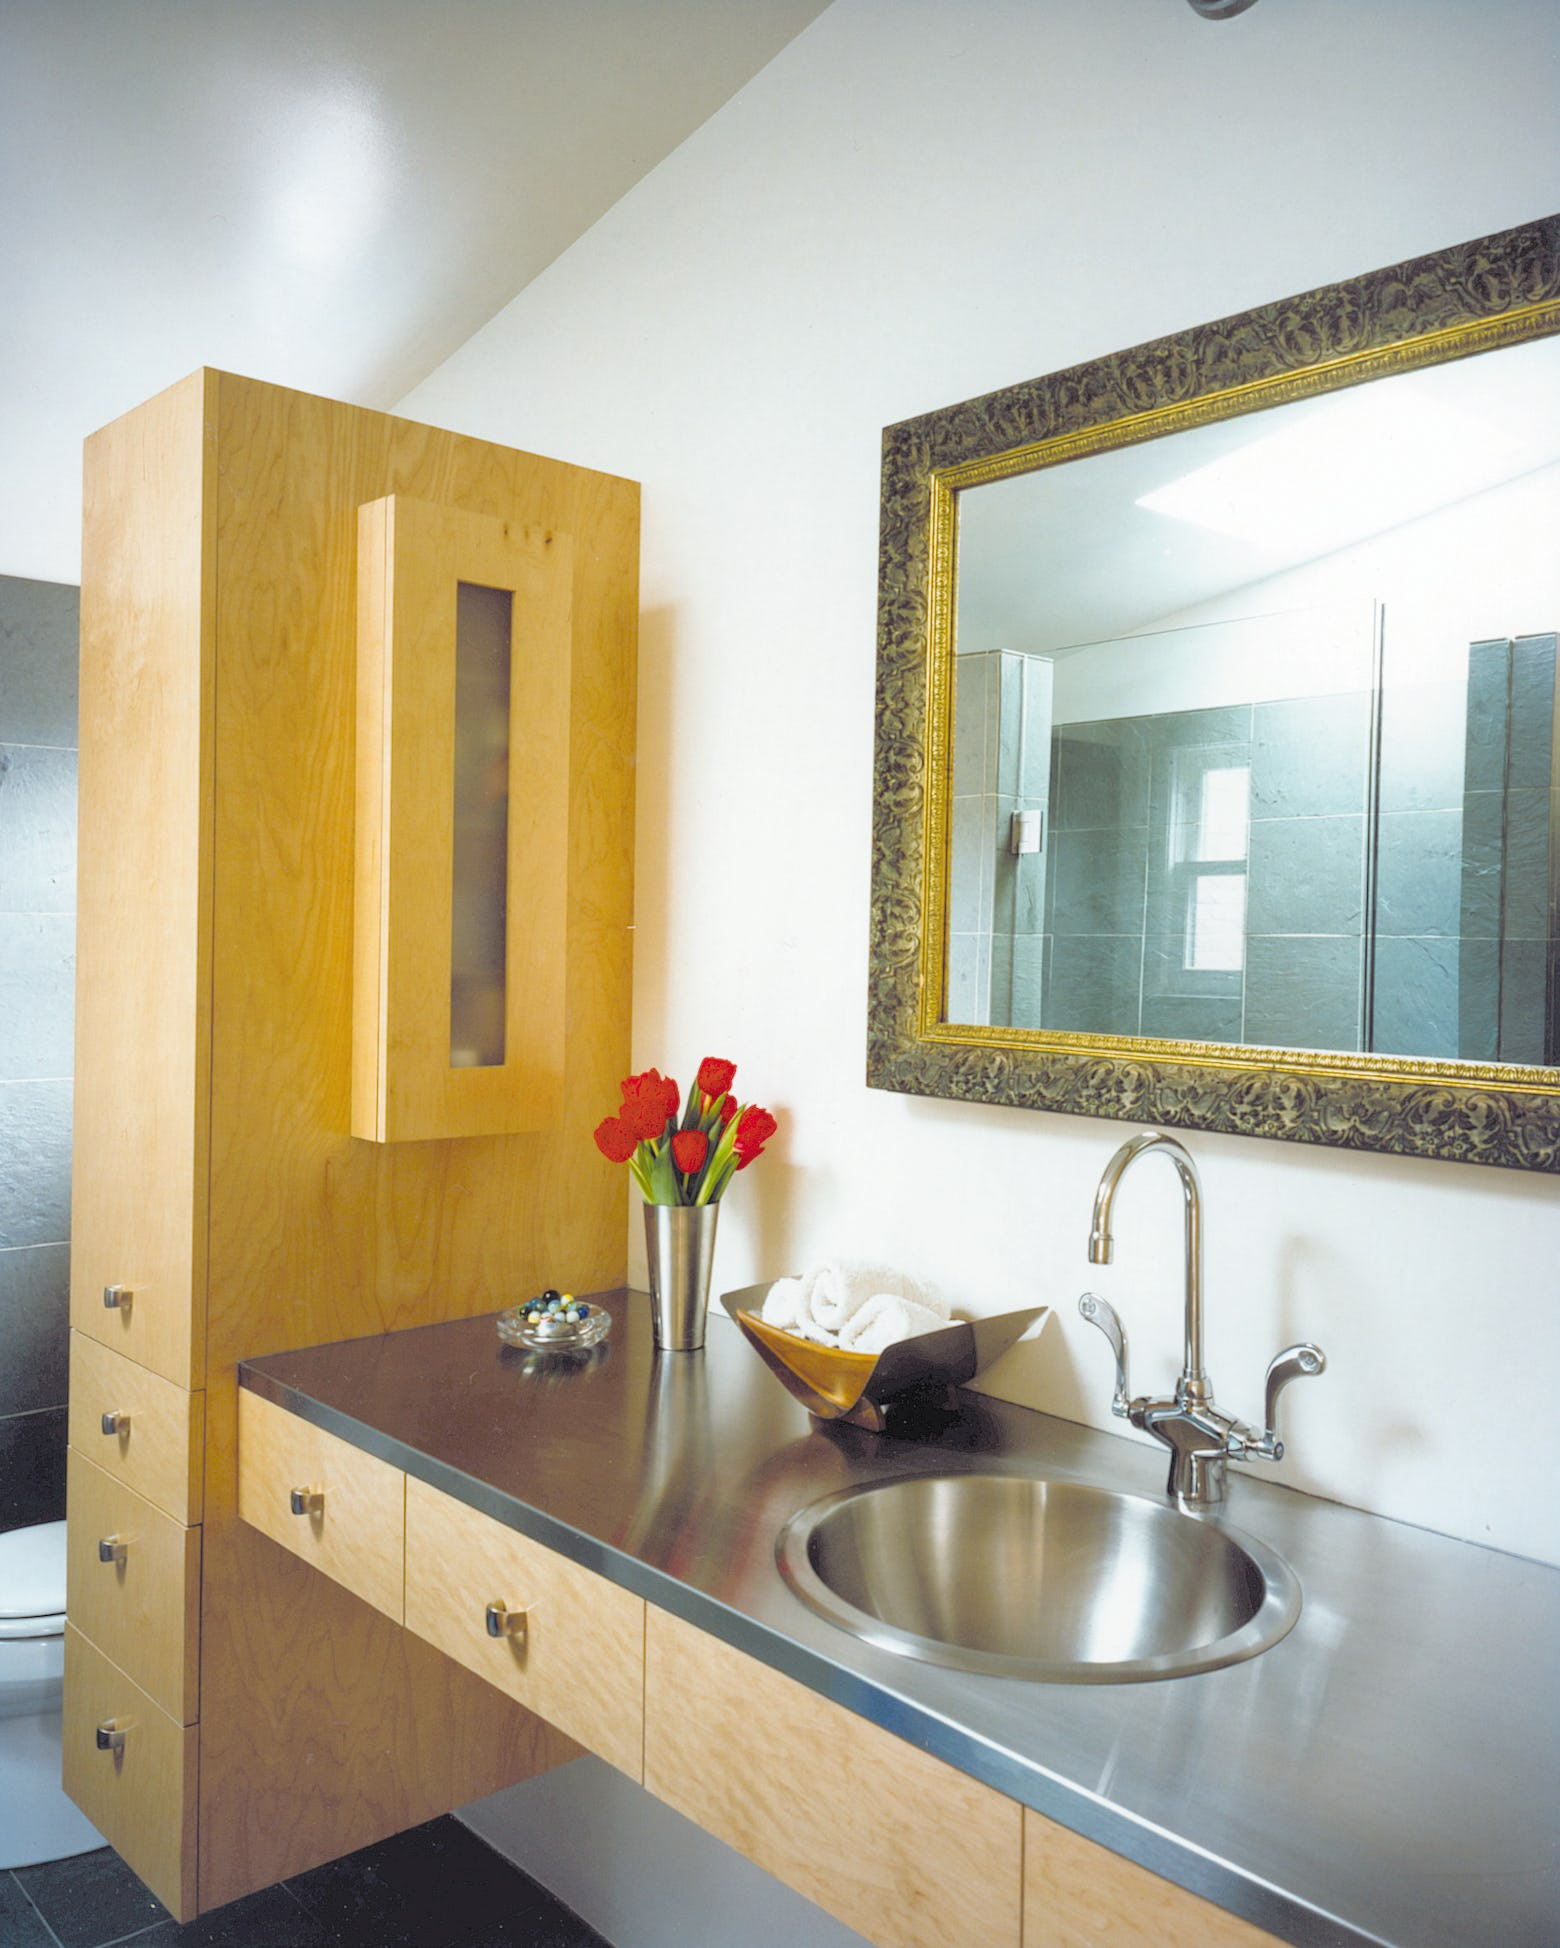 Builtform construction chenery bathroom modern steel wood mirror smaller copy